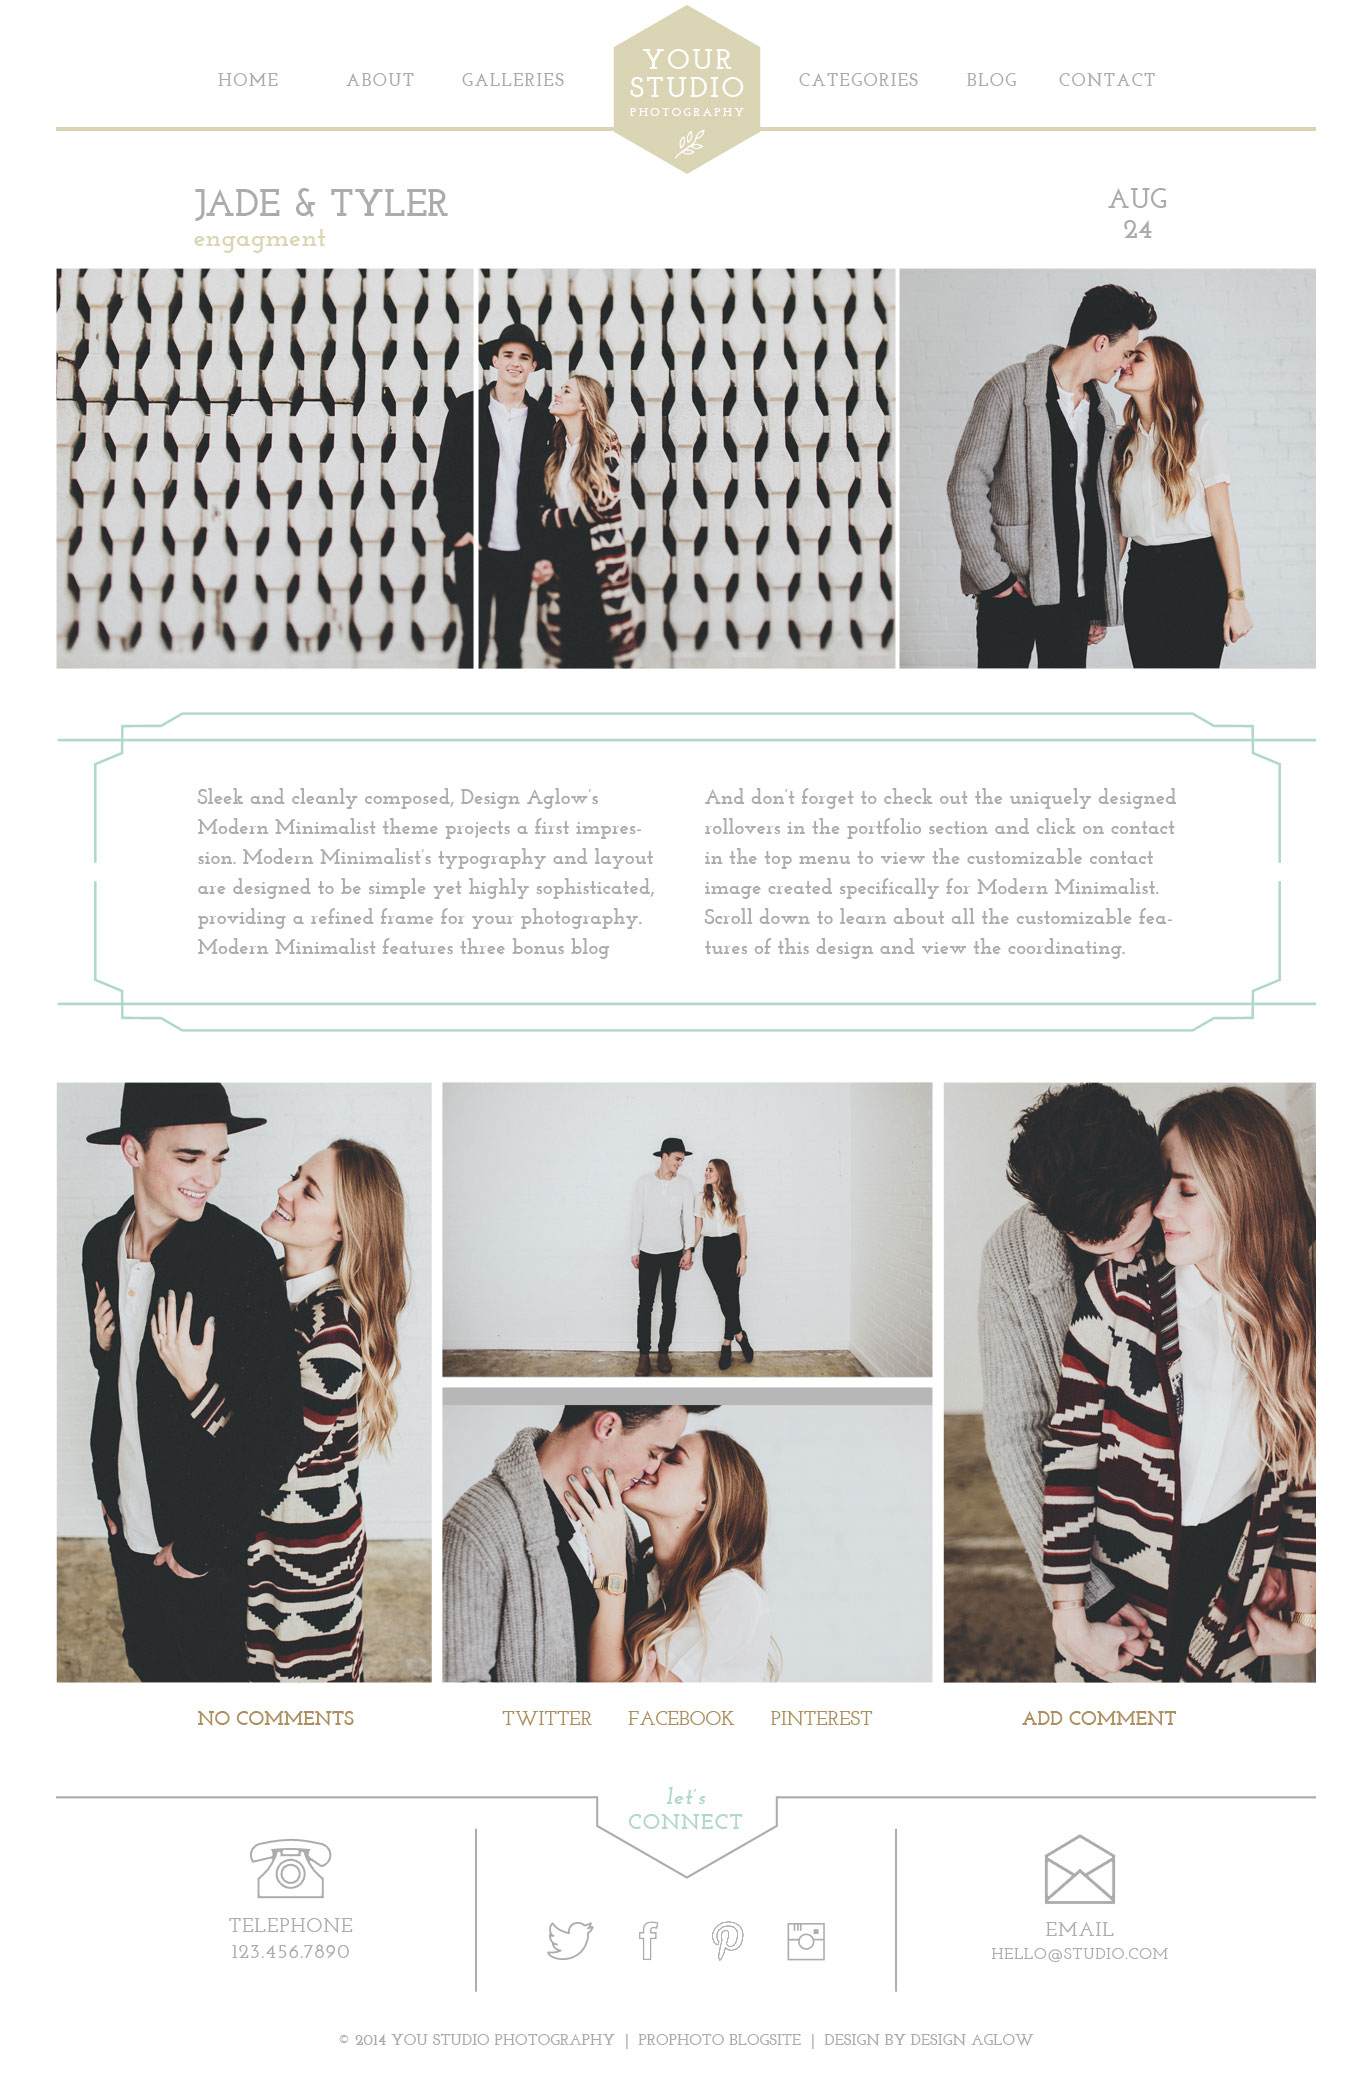 ProPhoto-Blogsite-2-Blog-_Hallie-Creswell.jpg